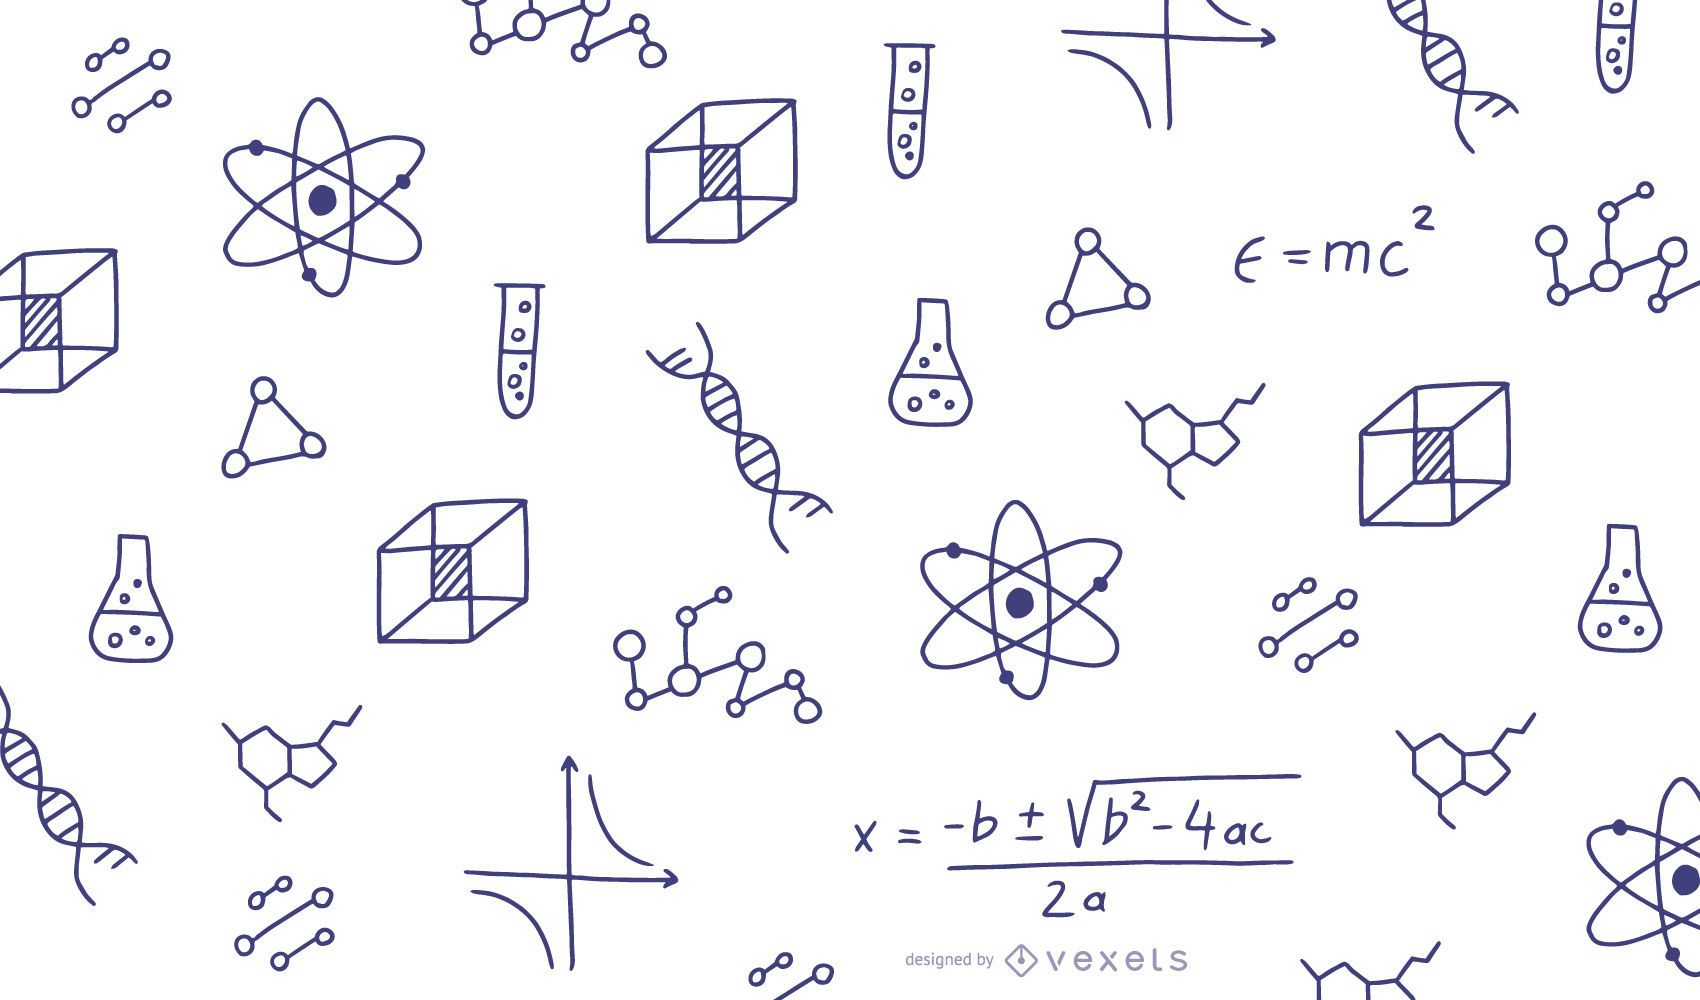 Mathe kritzelt Illustration